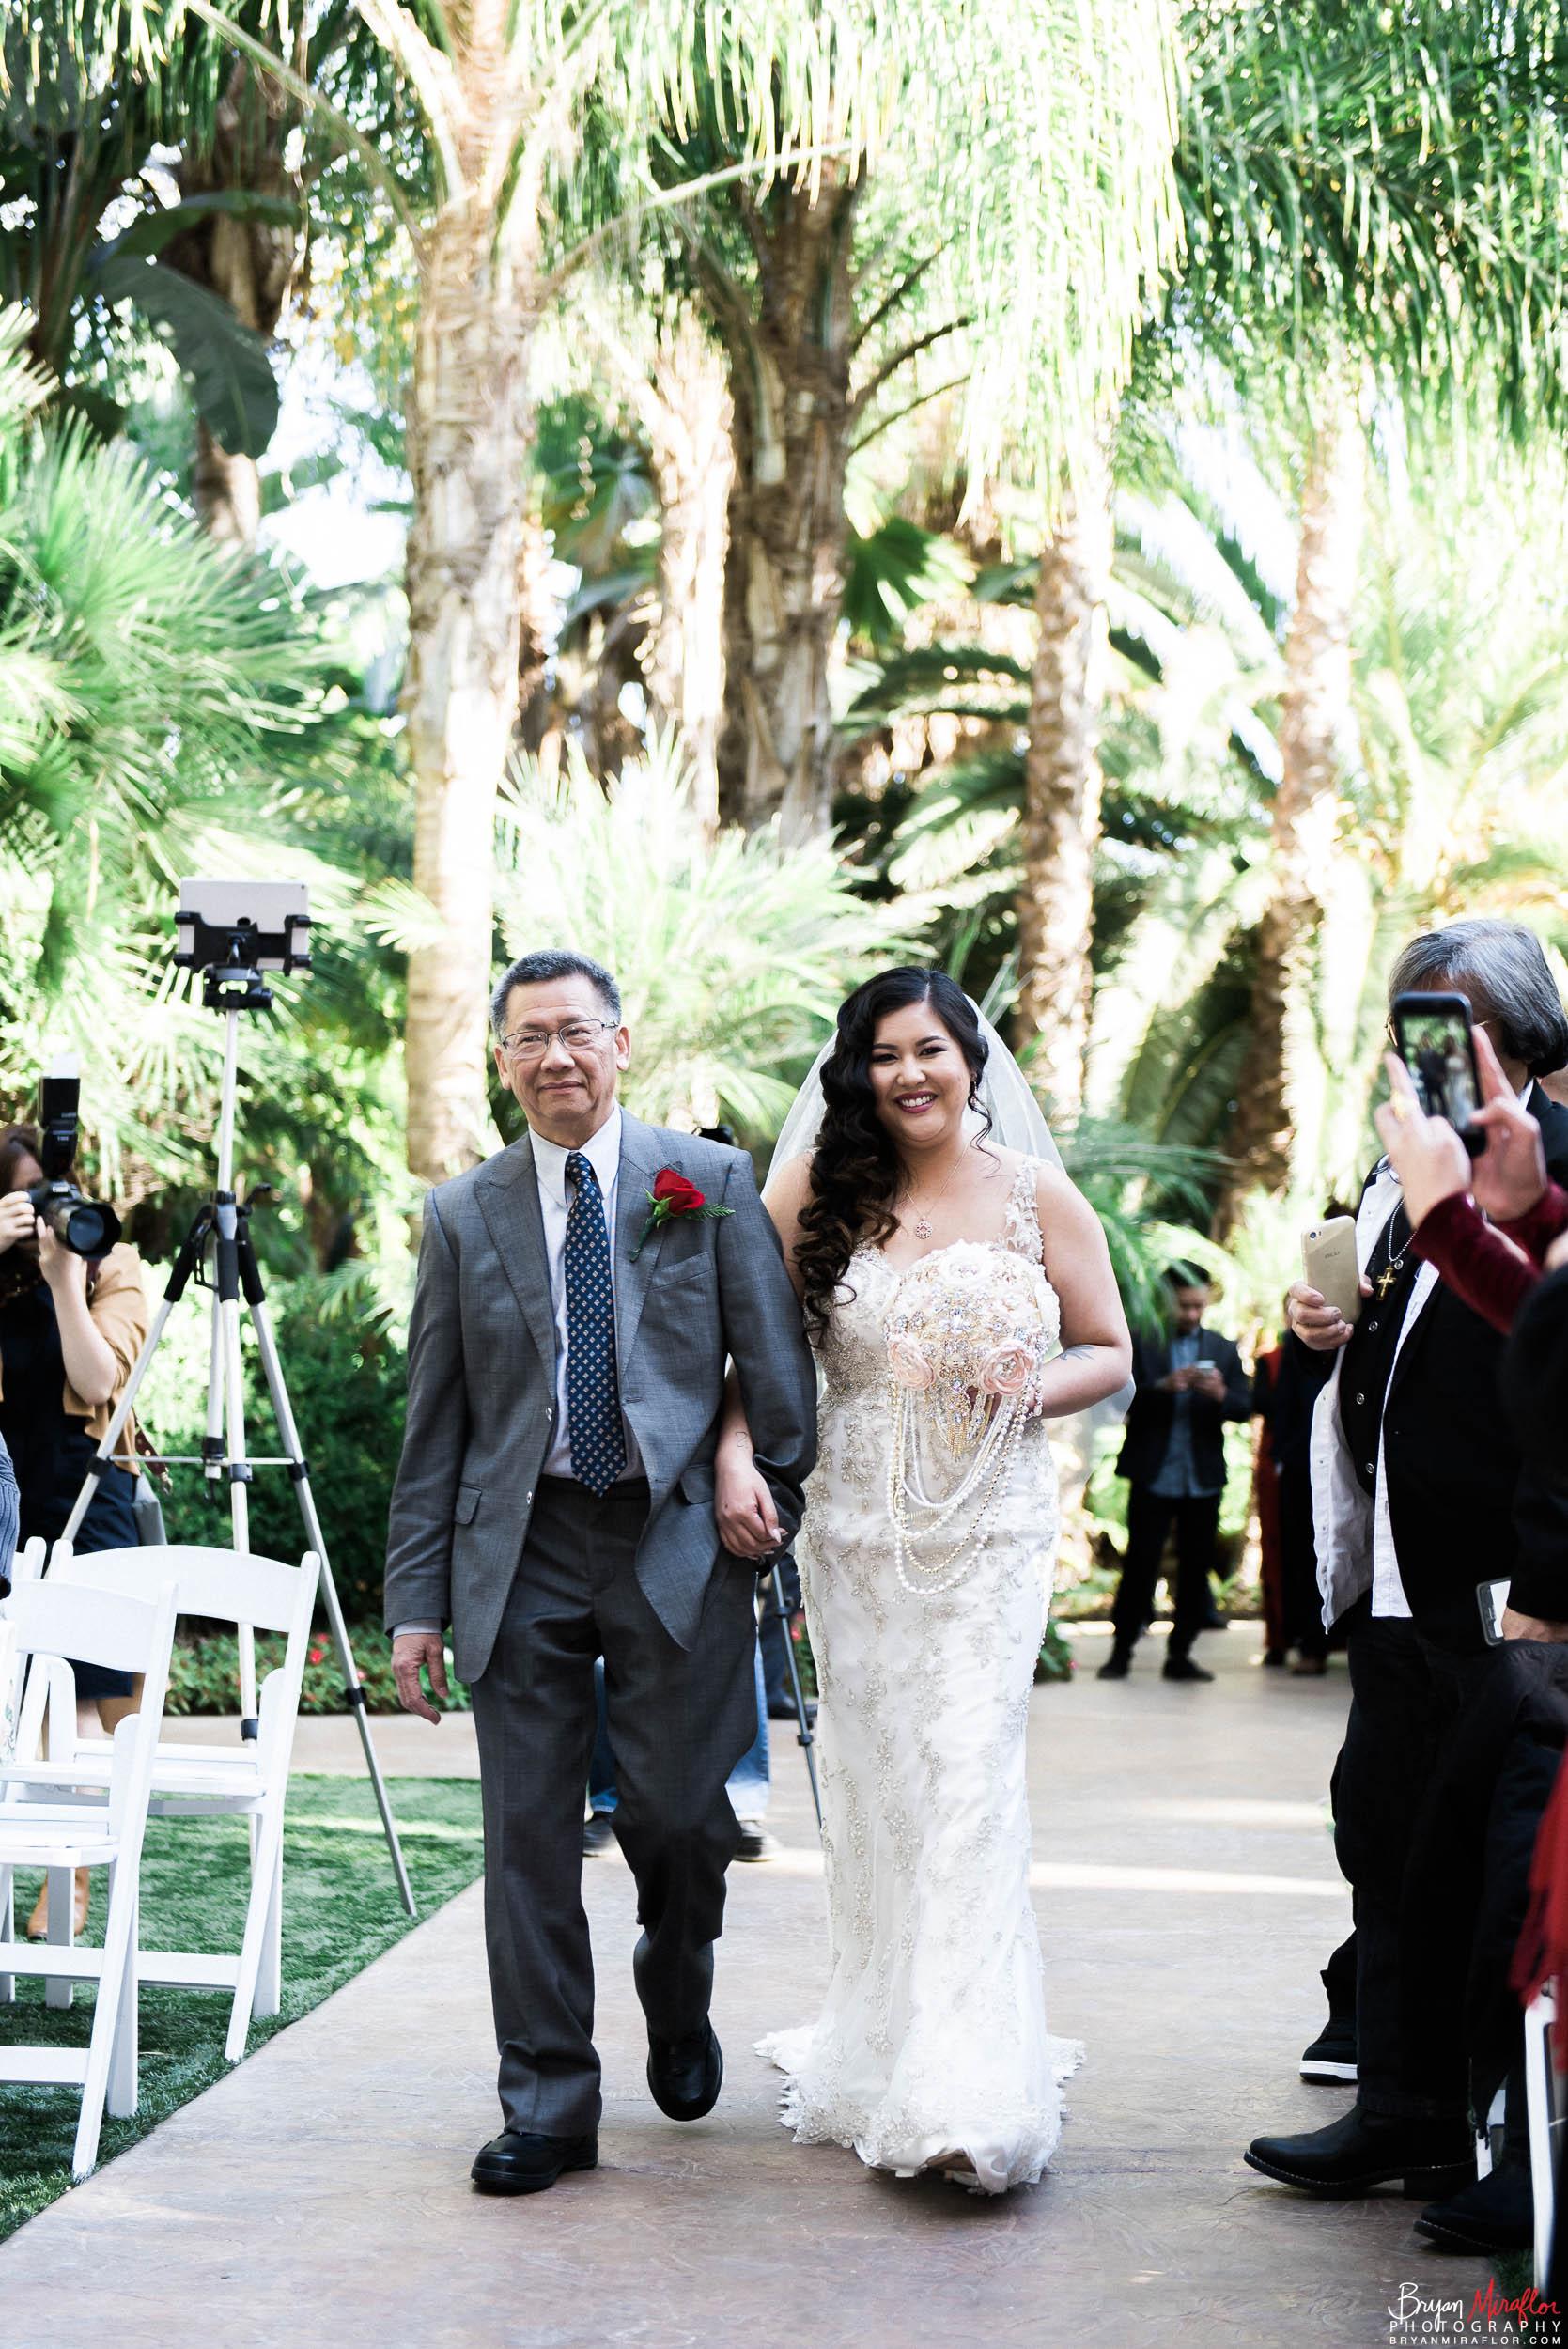 Bryan-Miraflor-Photography-Hannah-Jonathan-Married-Grand-Traditions-Estate-Gardens-Fallbrook-20171222-090.jpg